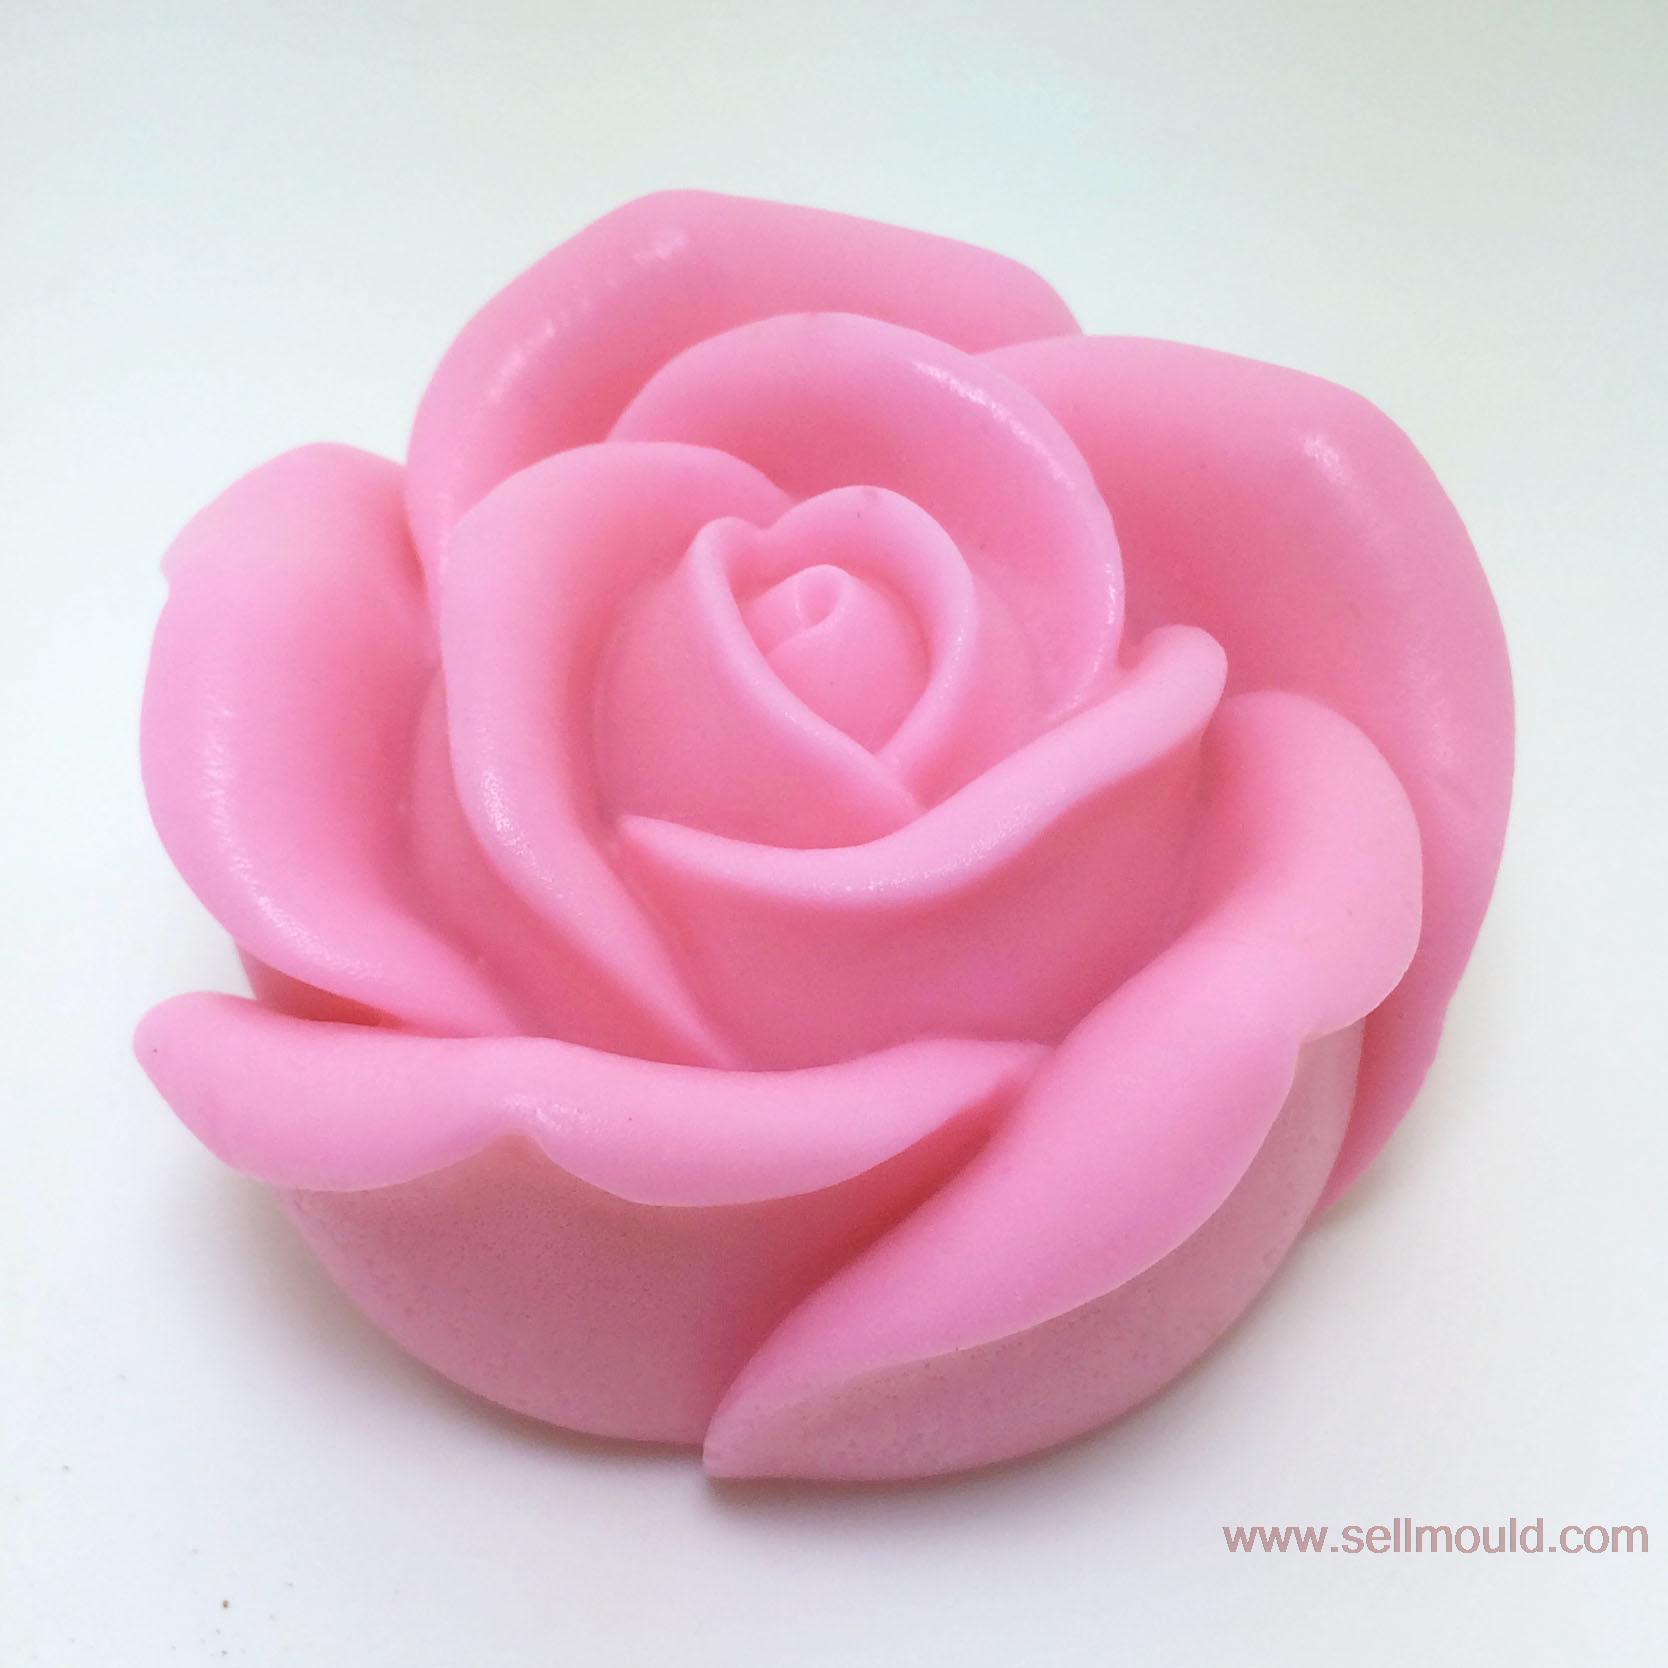 d rose molde de silicona jabn molde de gel de slice molde decoracin moldes para velas